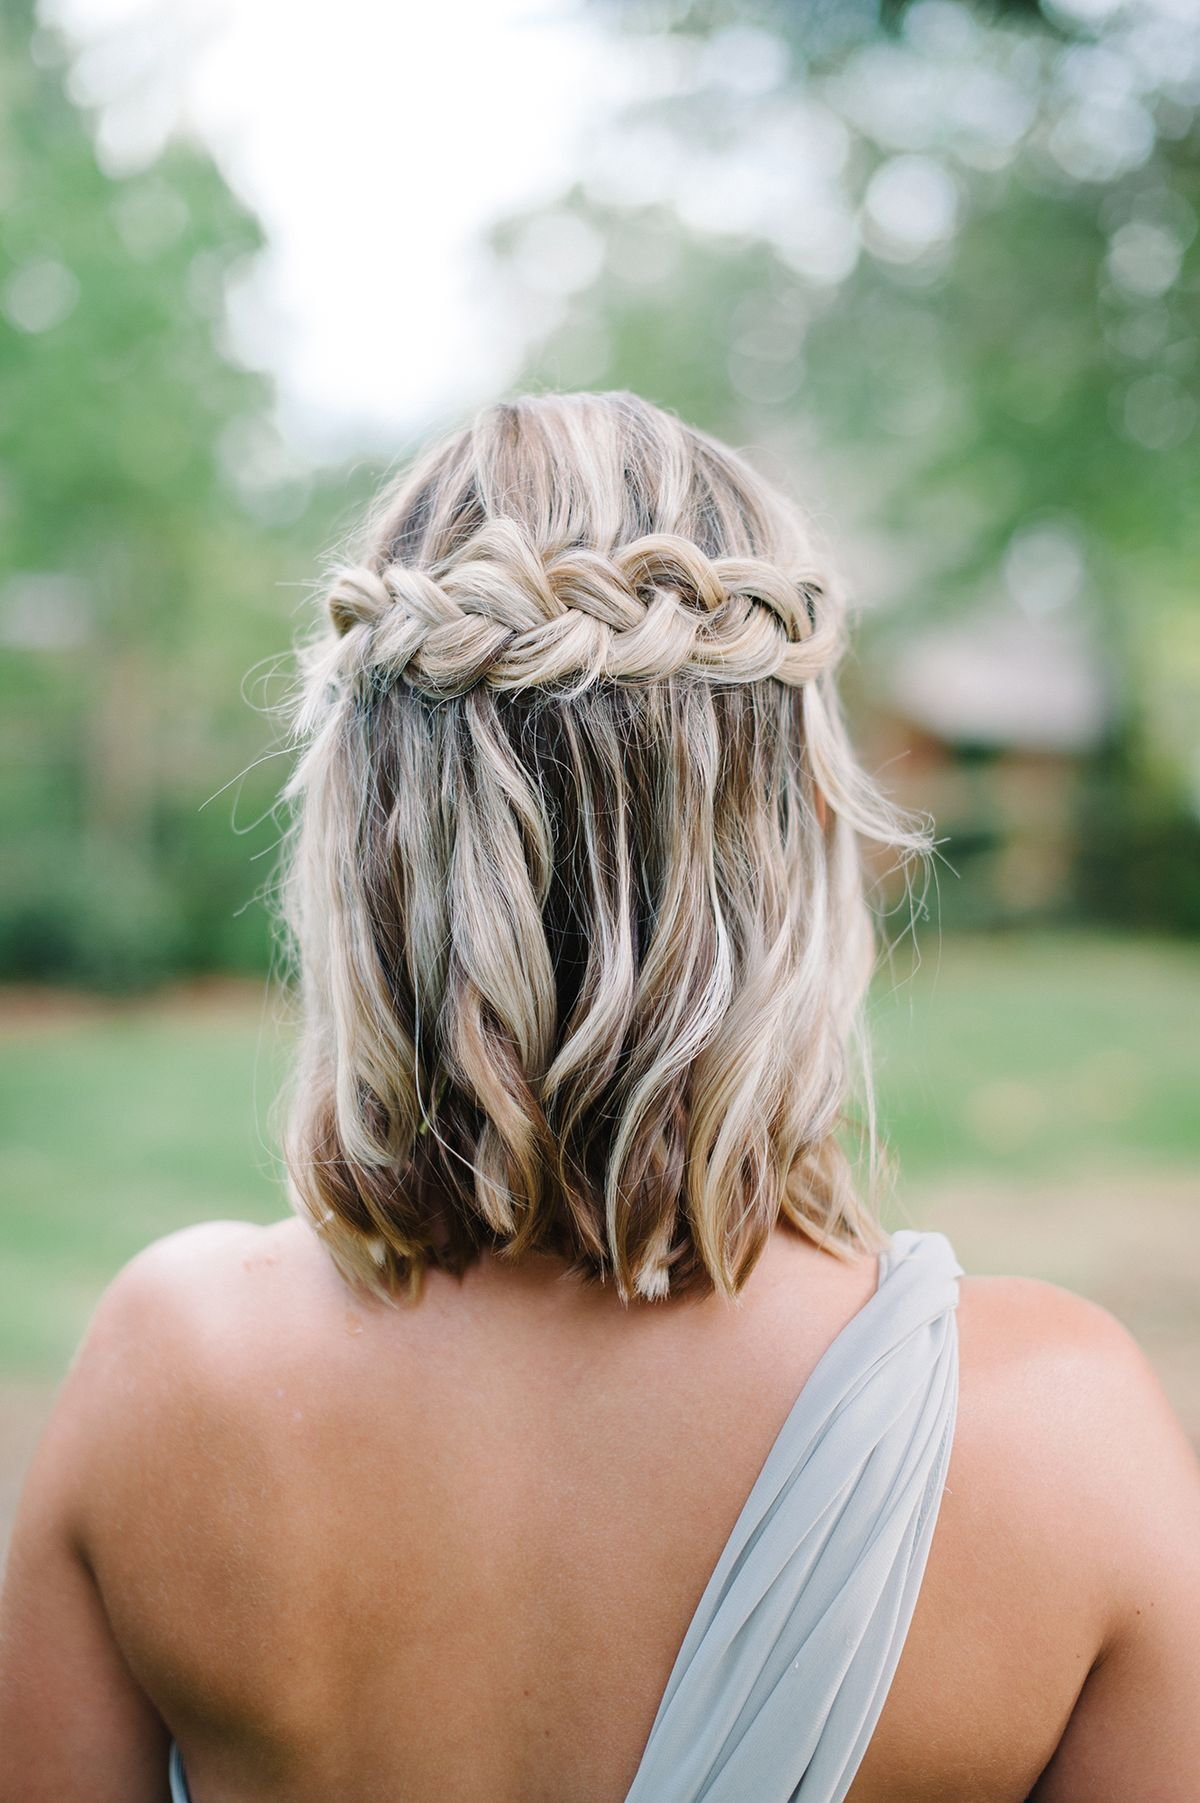 Simple wedding hairstyles best photos nynns wedding pinterest